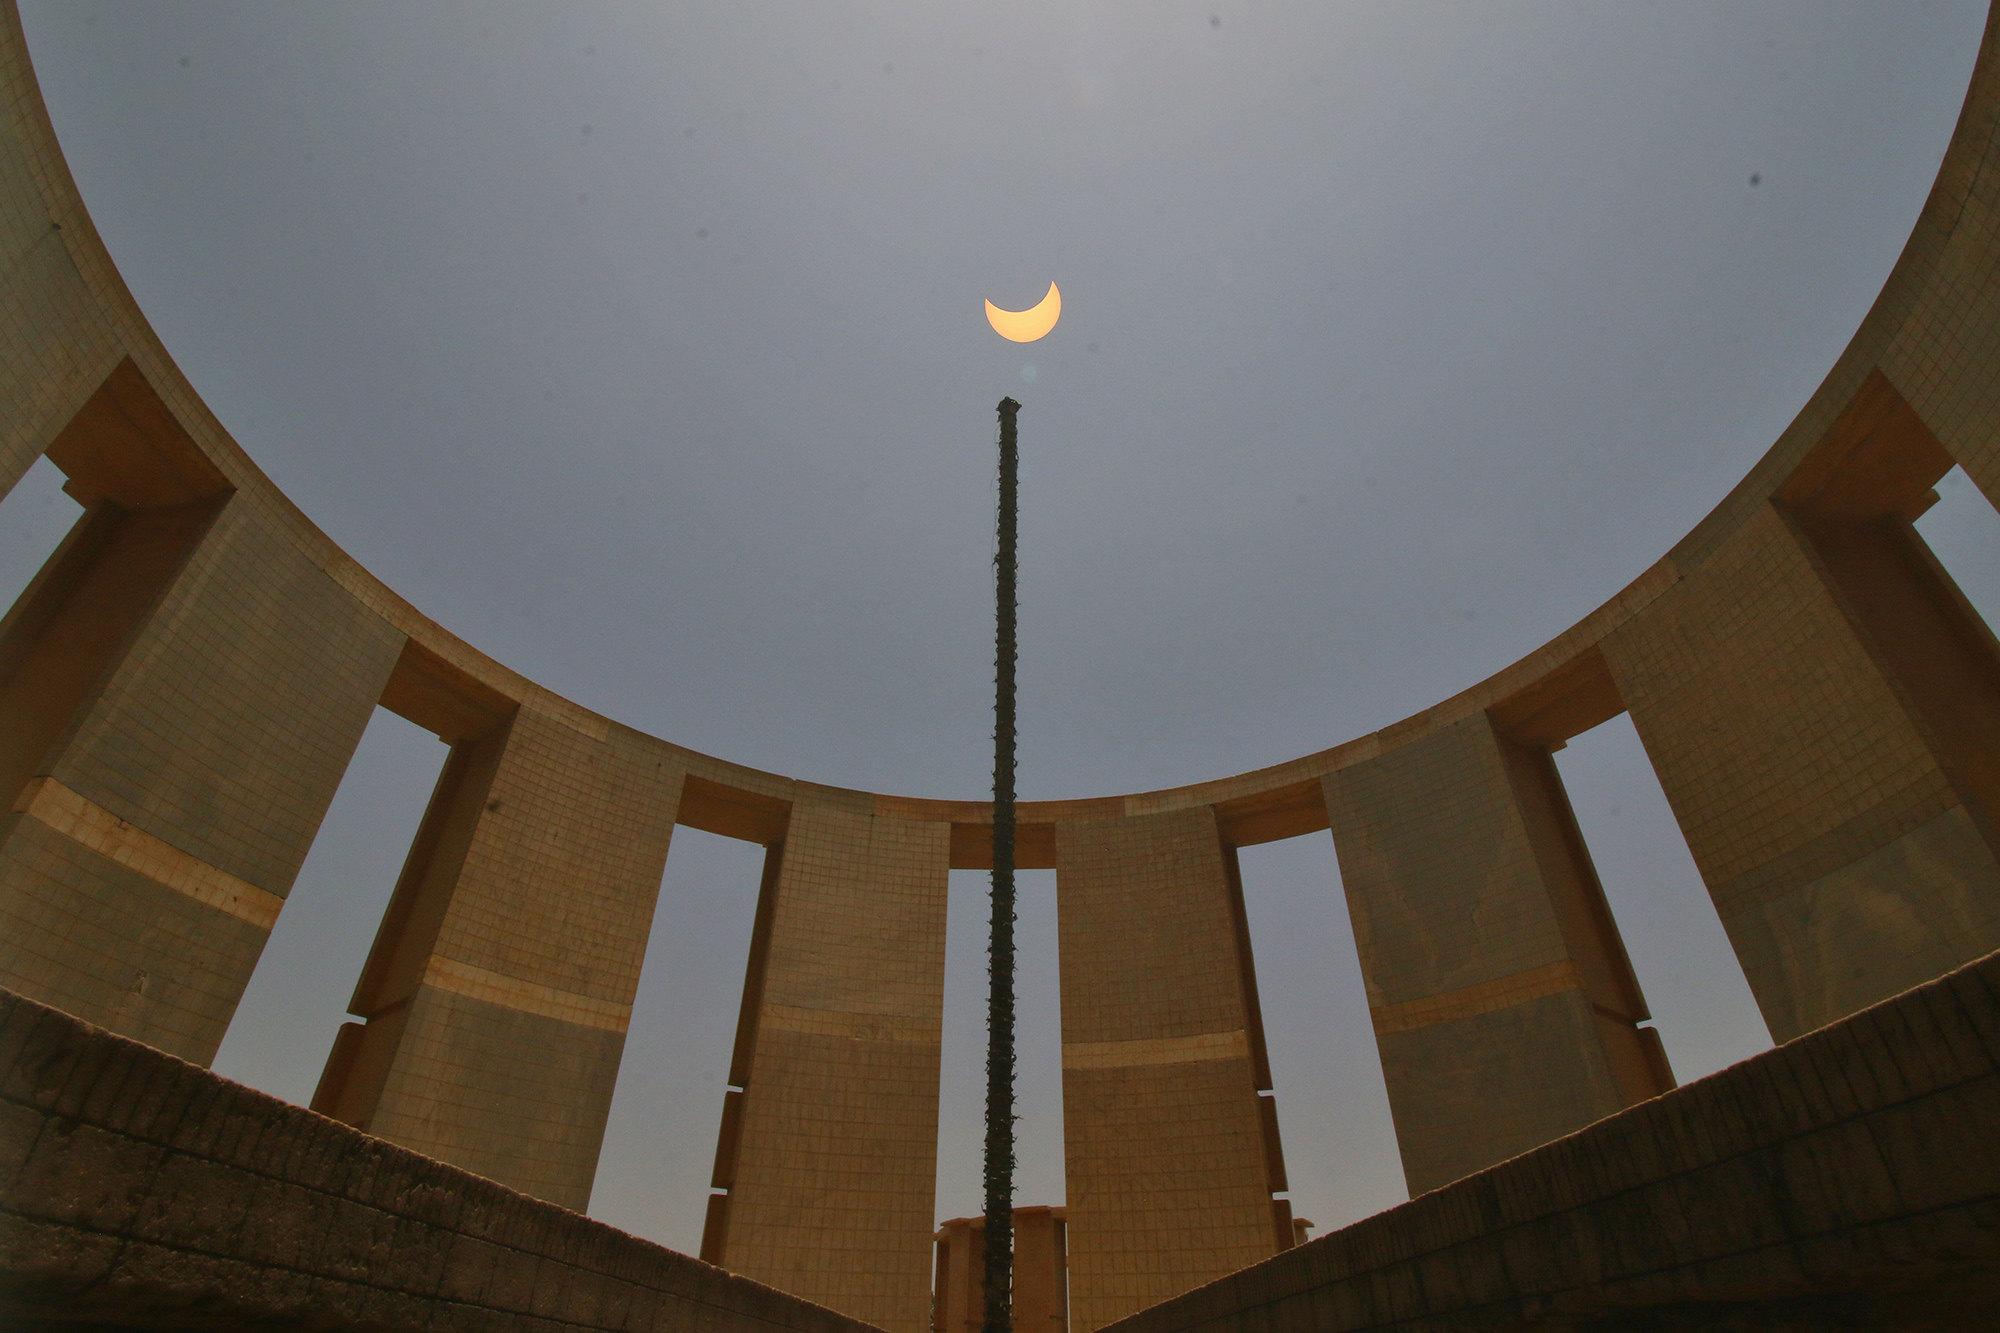 Вид изобсерватории Джантар-Мантар вДжайпуре, Индия